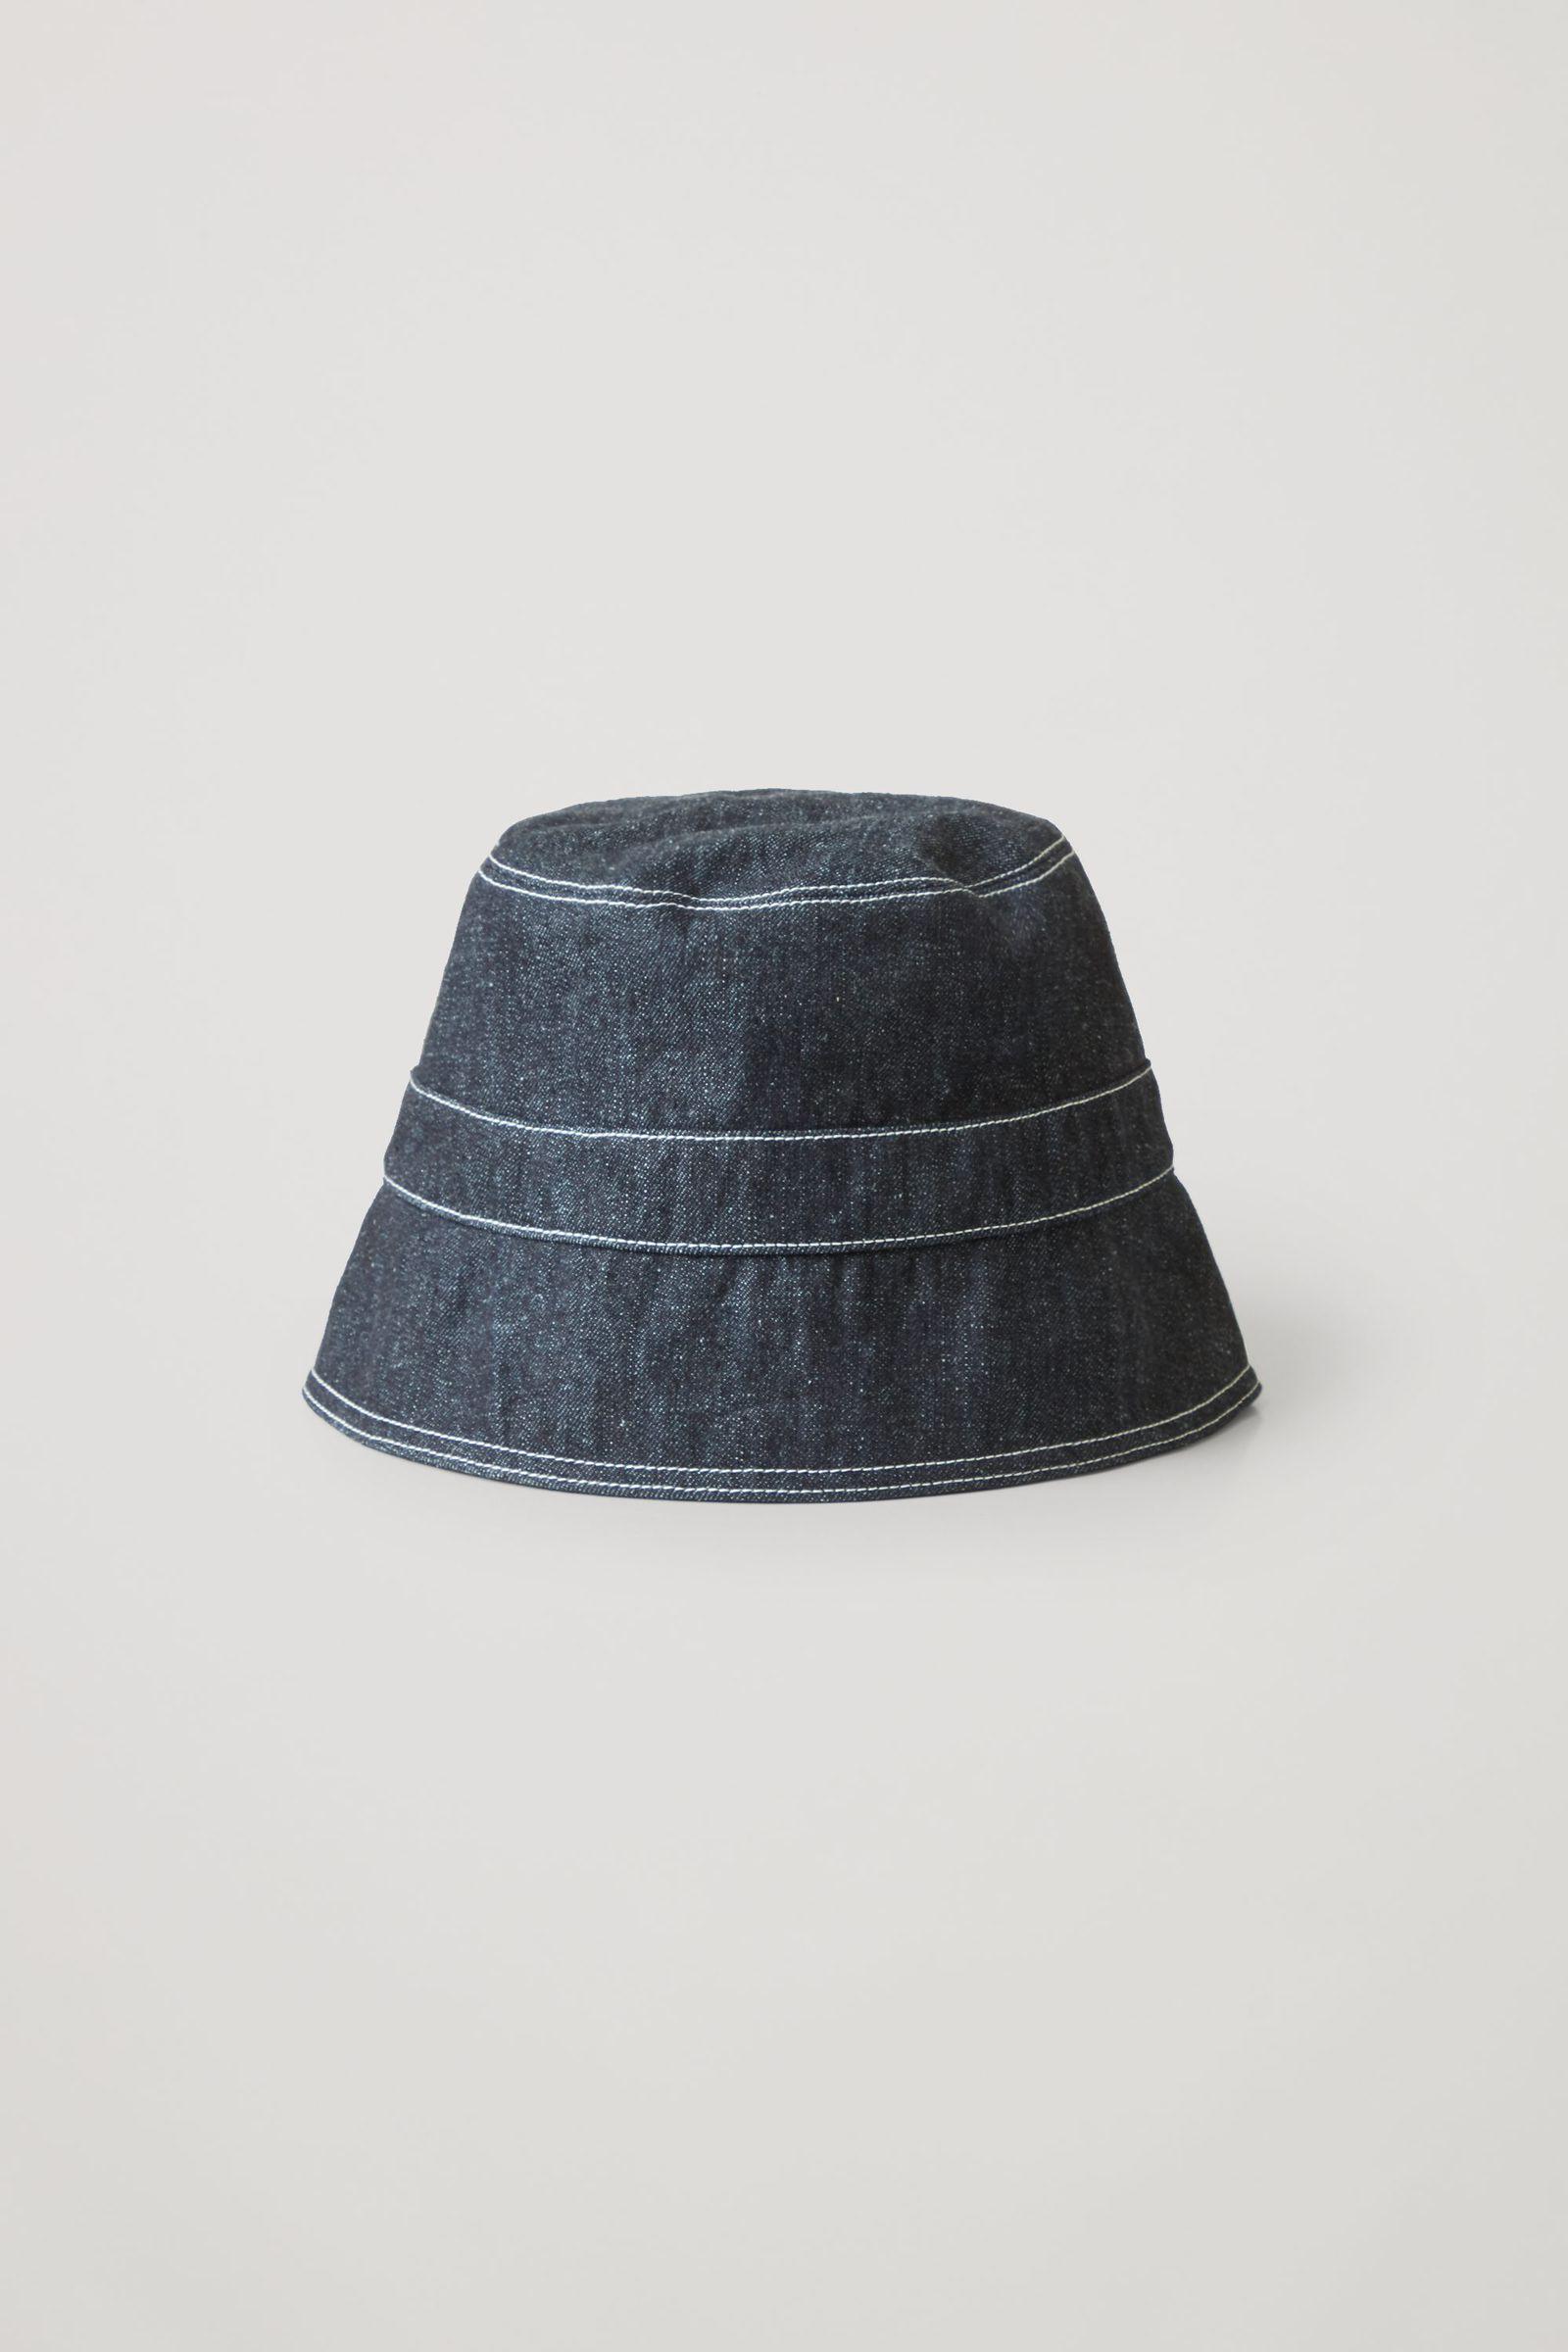 COS 오가닉 헴프 믹스 데님 버킷 햇의 다크 블루컬러 Product입니다.